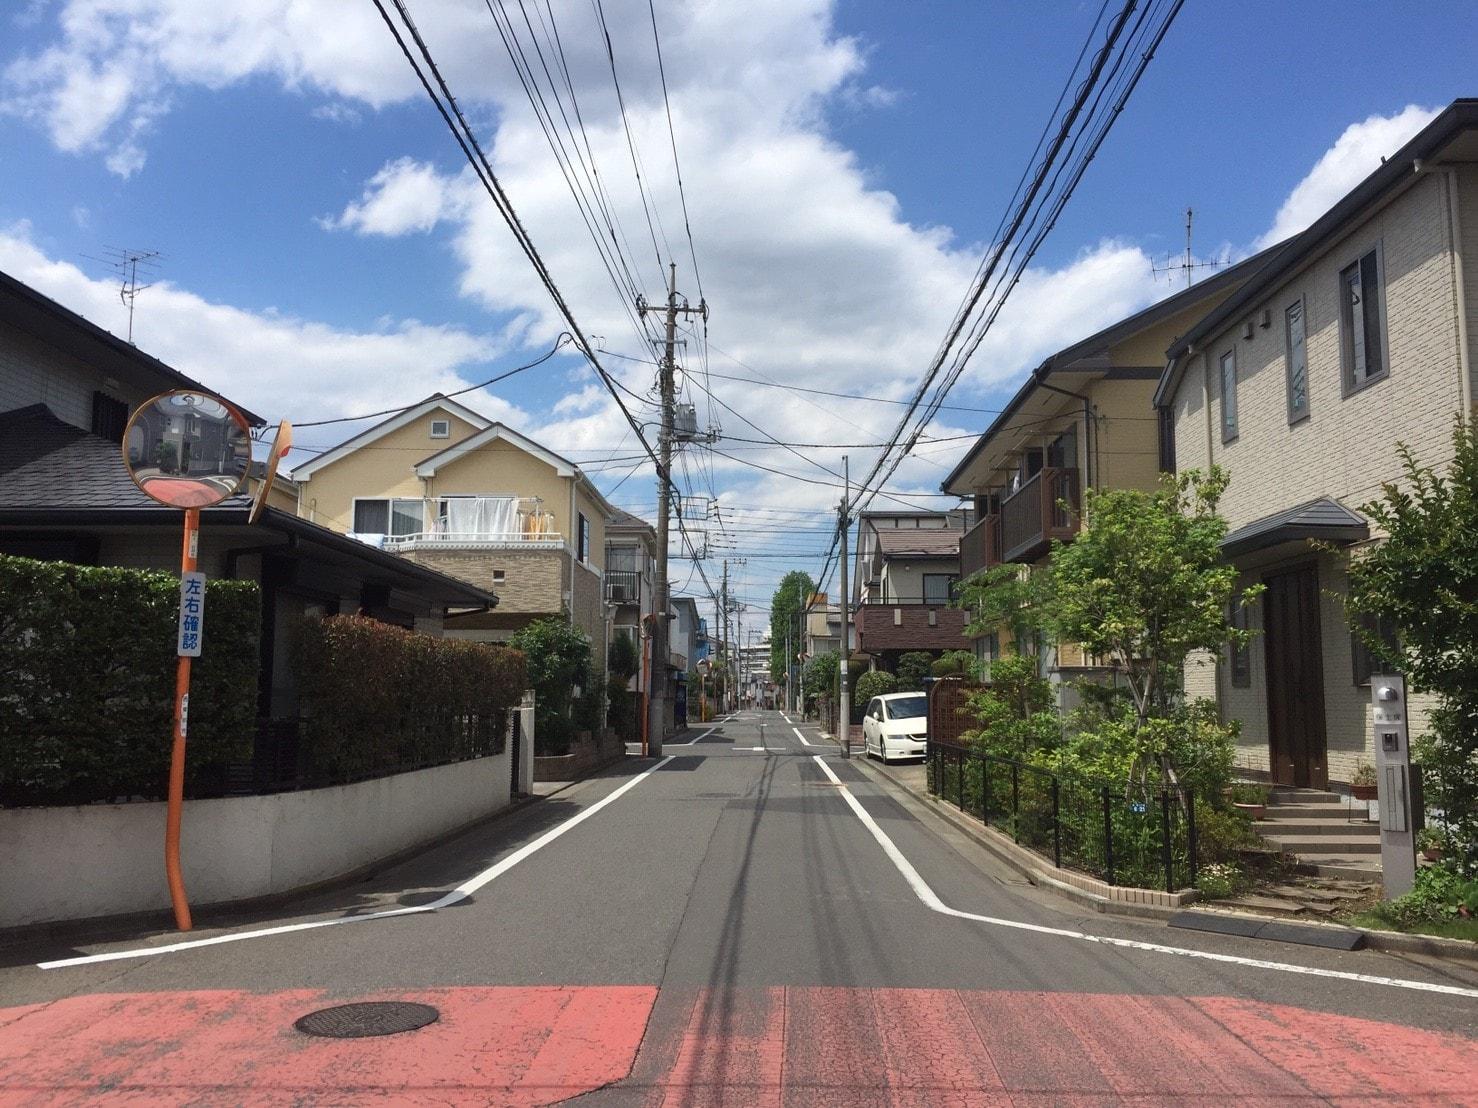 田無駅 周辺の住宅街